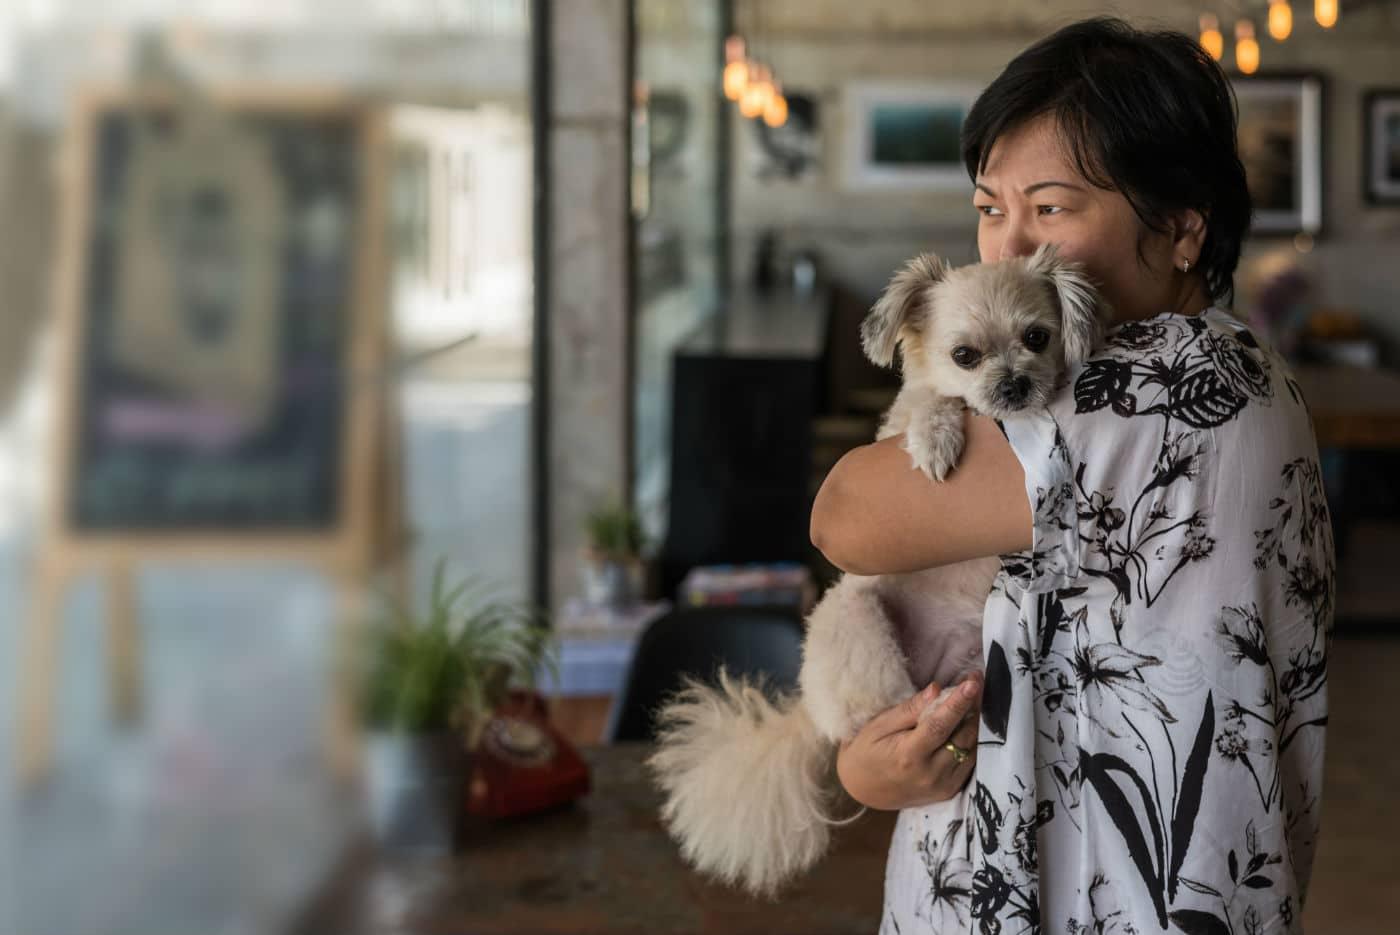 woman holding dog coronavirus